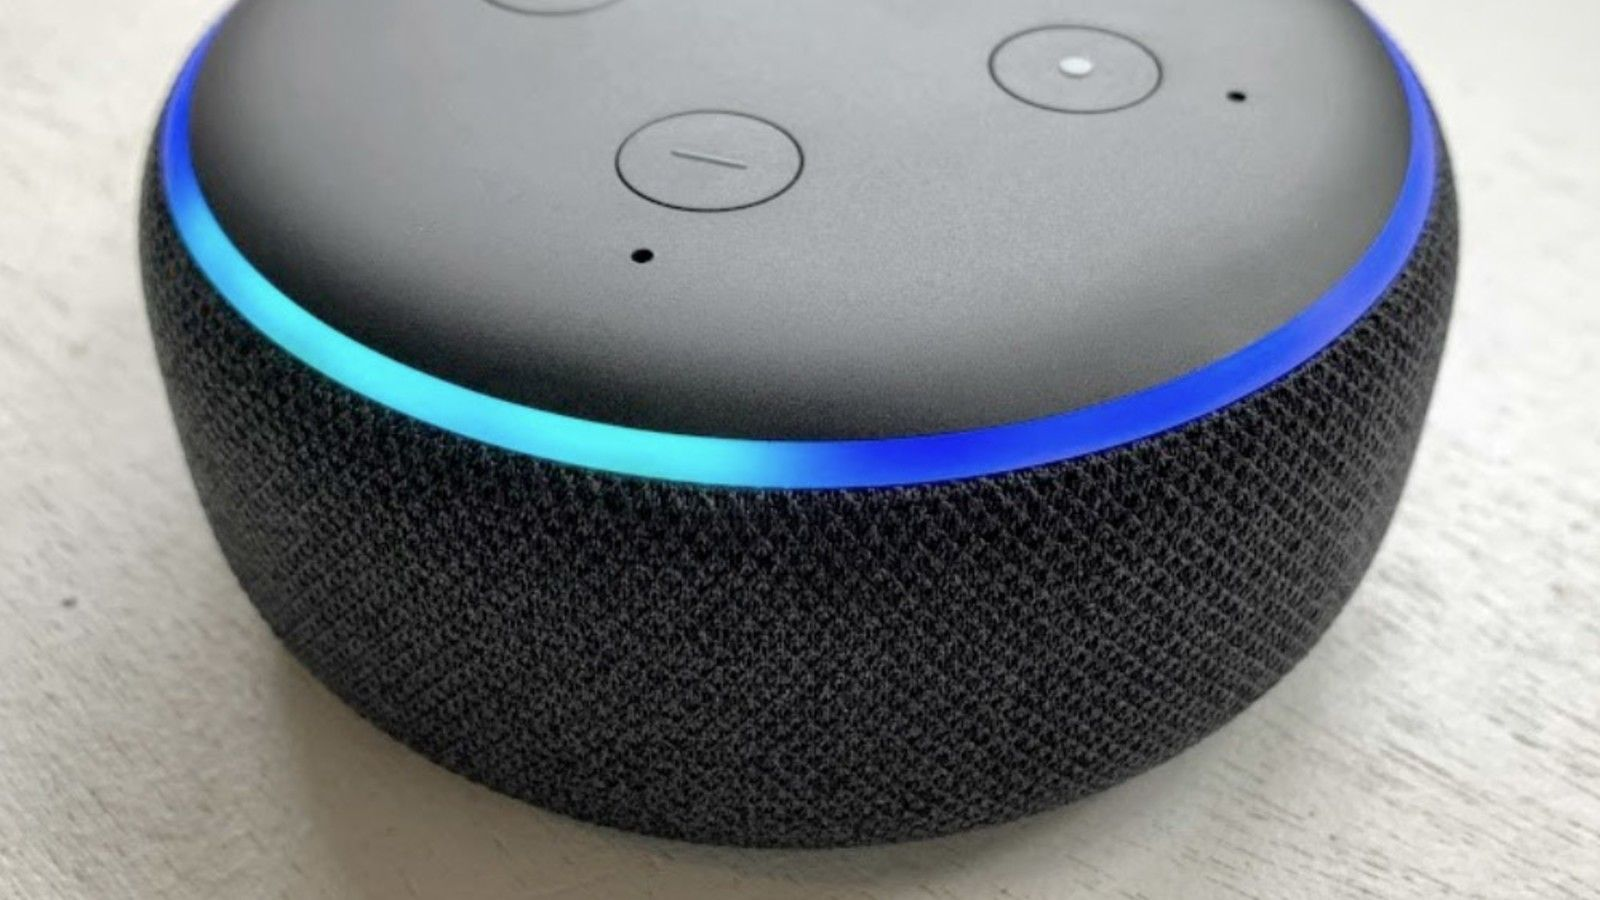 How To Set Up Your New Amazon Echo Dot Or Plus Android Central Alexa Setup Alexa App Amazon